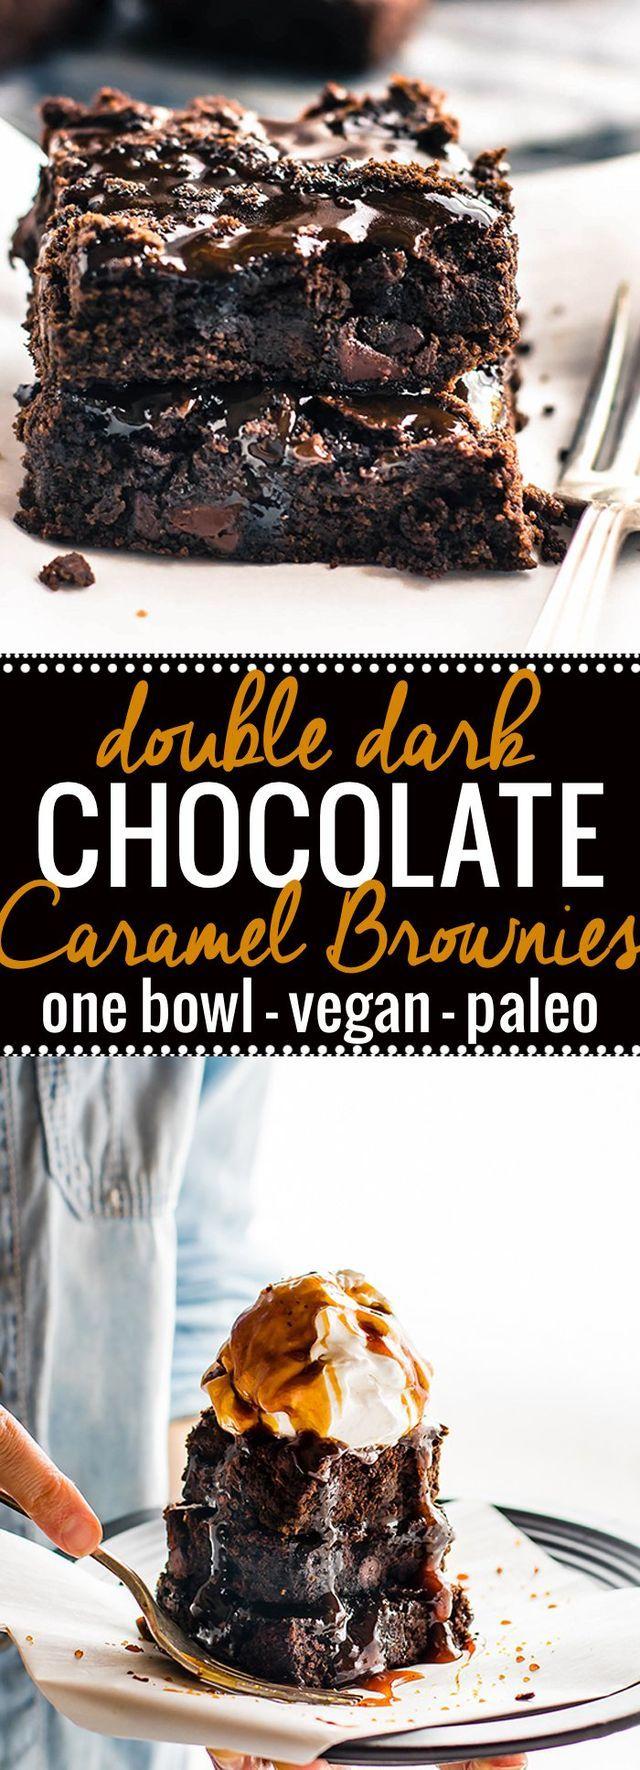 One Bowl Vegan Dark Chocolate Salted Caramel Brownies {Paleo} | Cotter Crunch | Bloglovin'